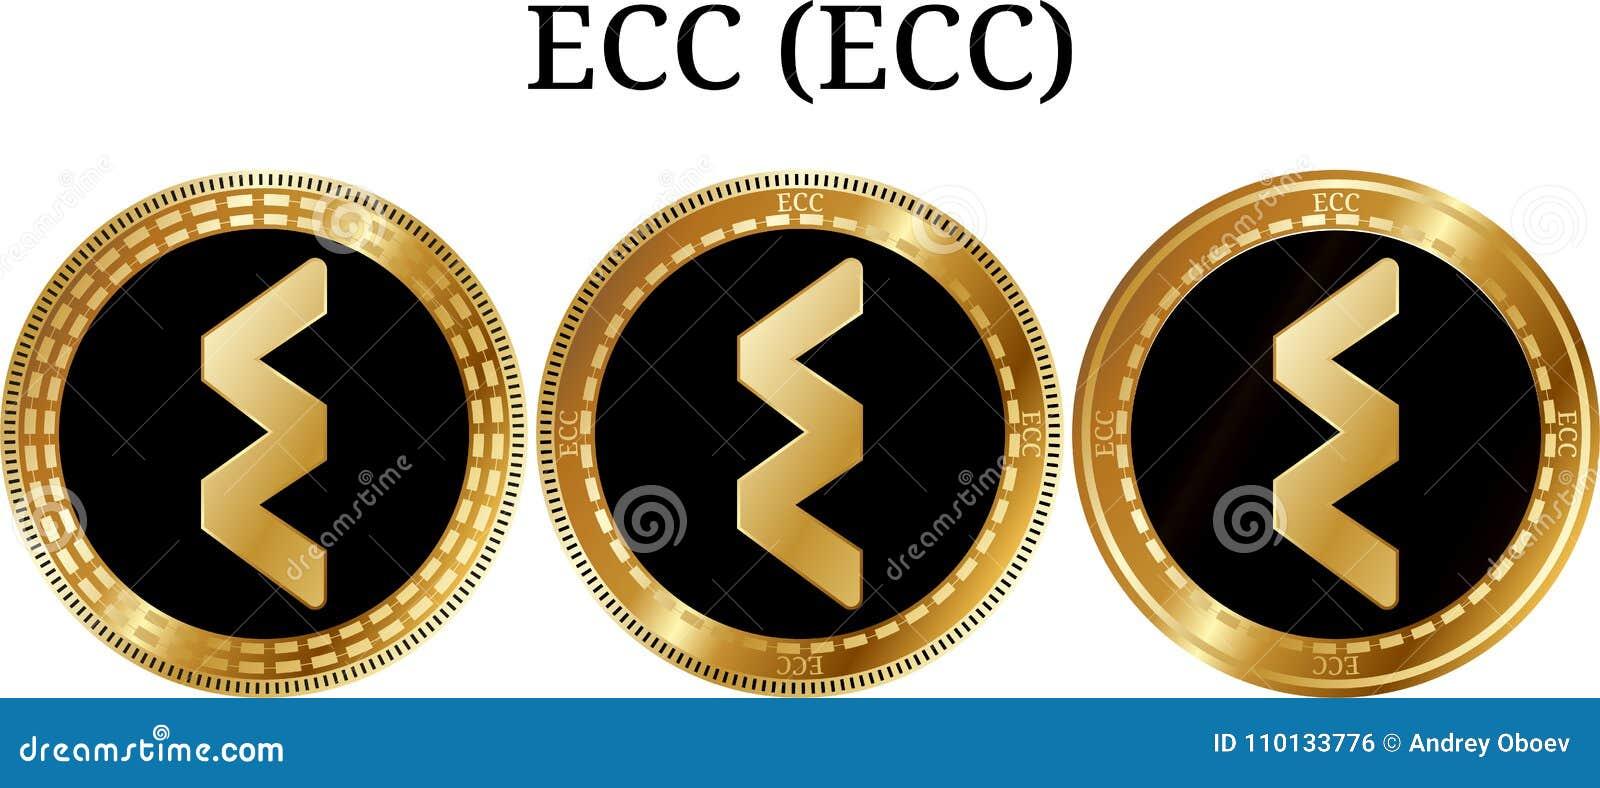 ecc cryptocurrency mining